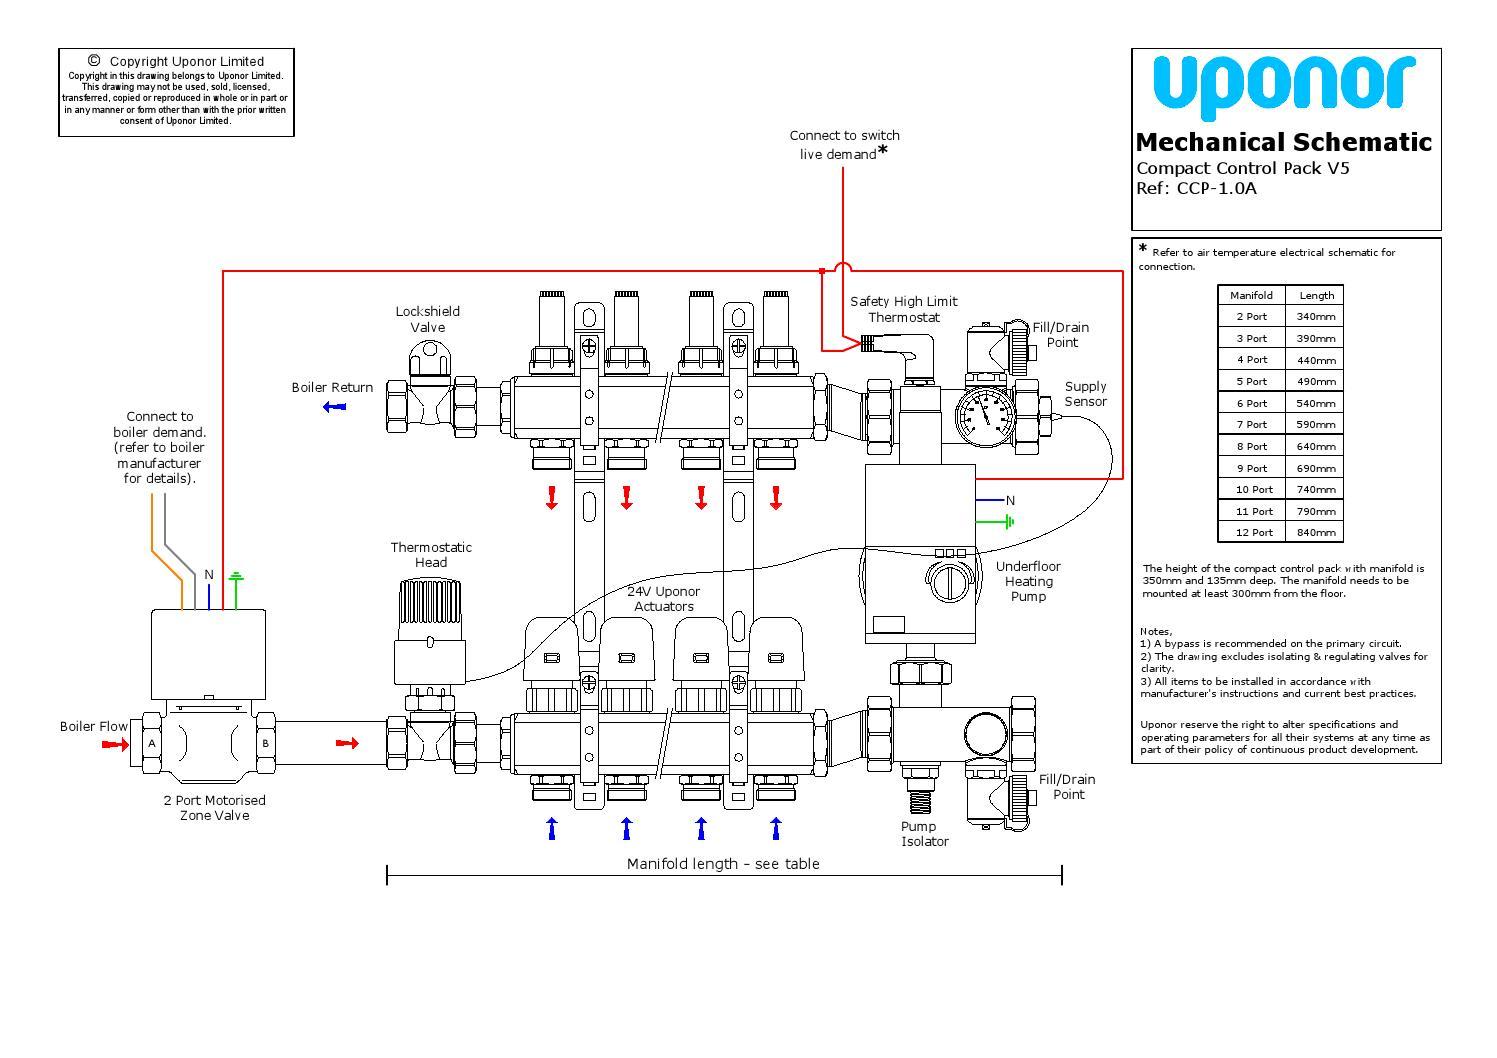 hight resolution of 4 wire wirsbo valve wiring diagrams wiring diagram forward wiring diagram for uponor underfloor heating